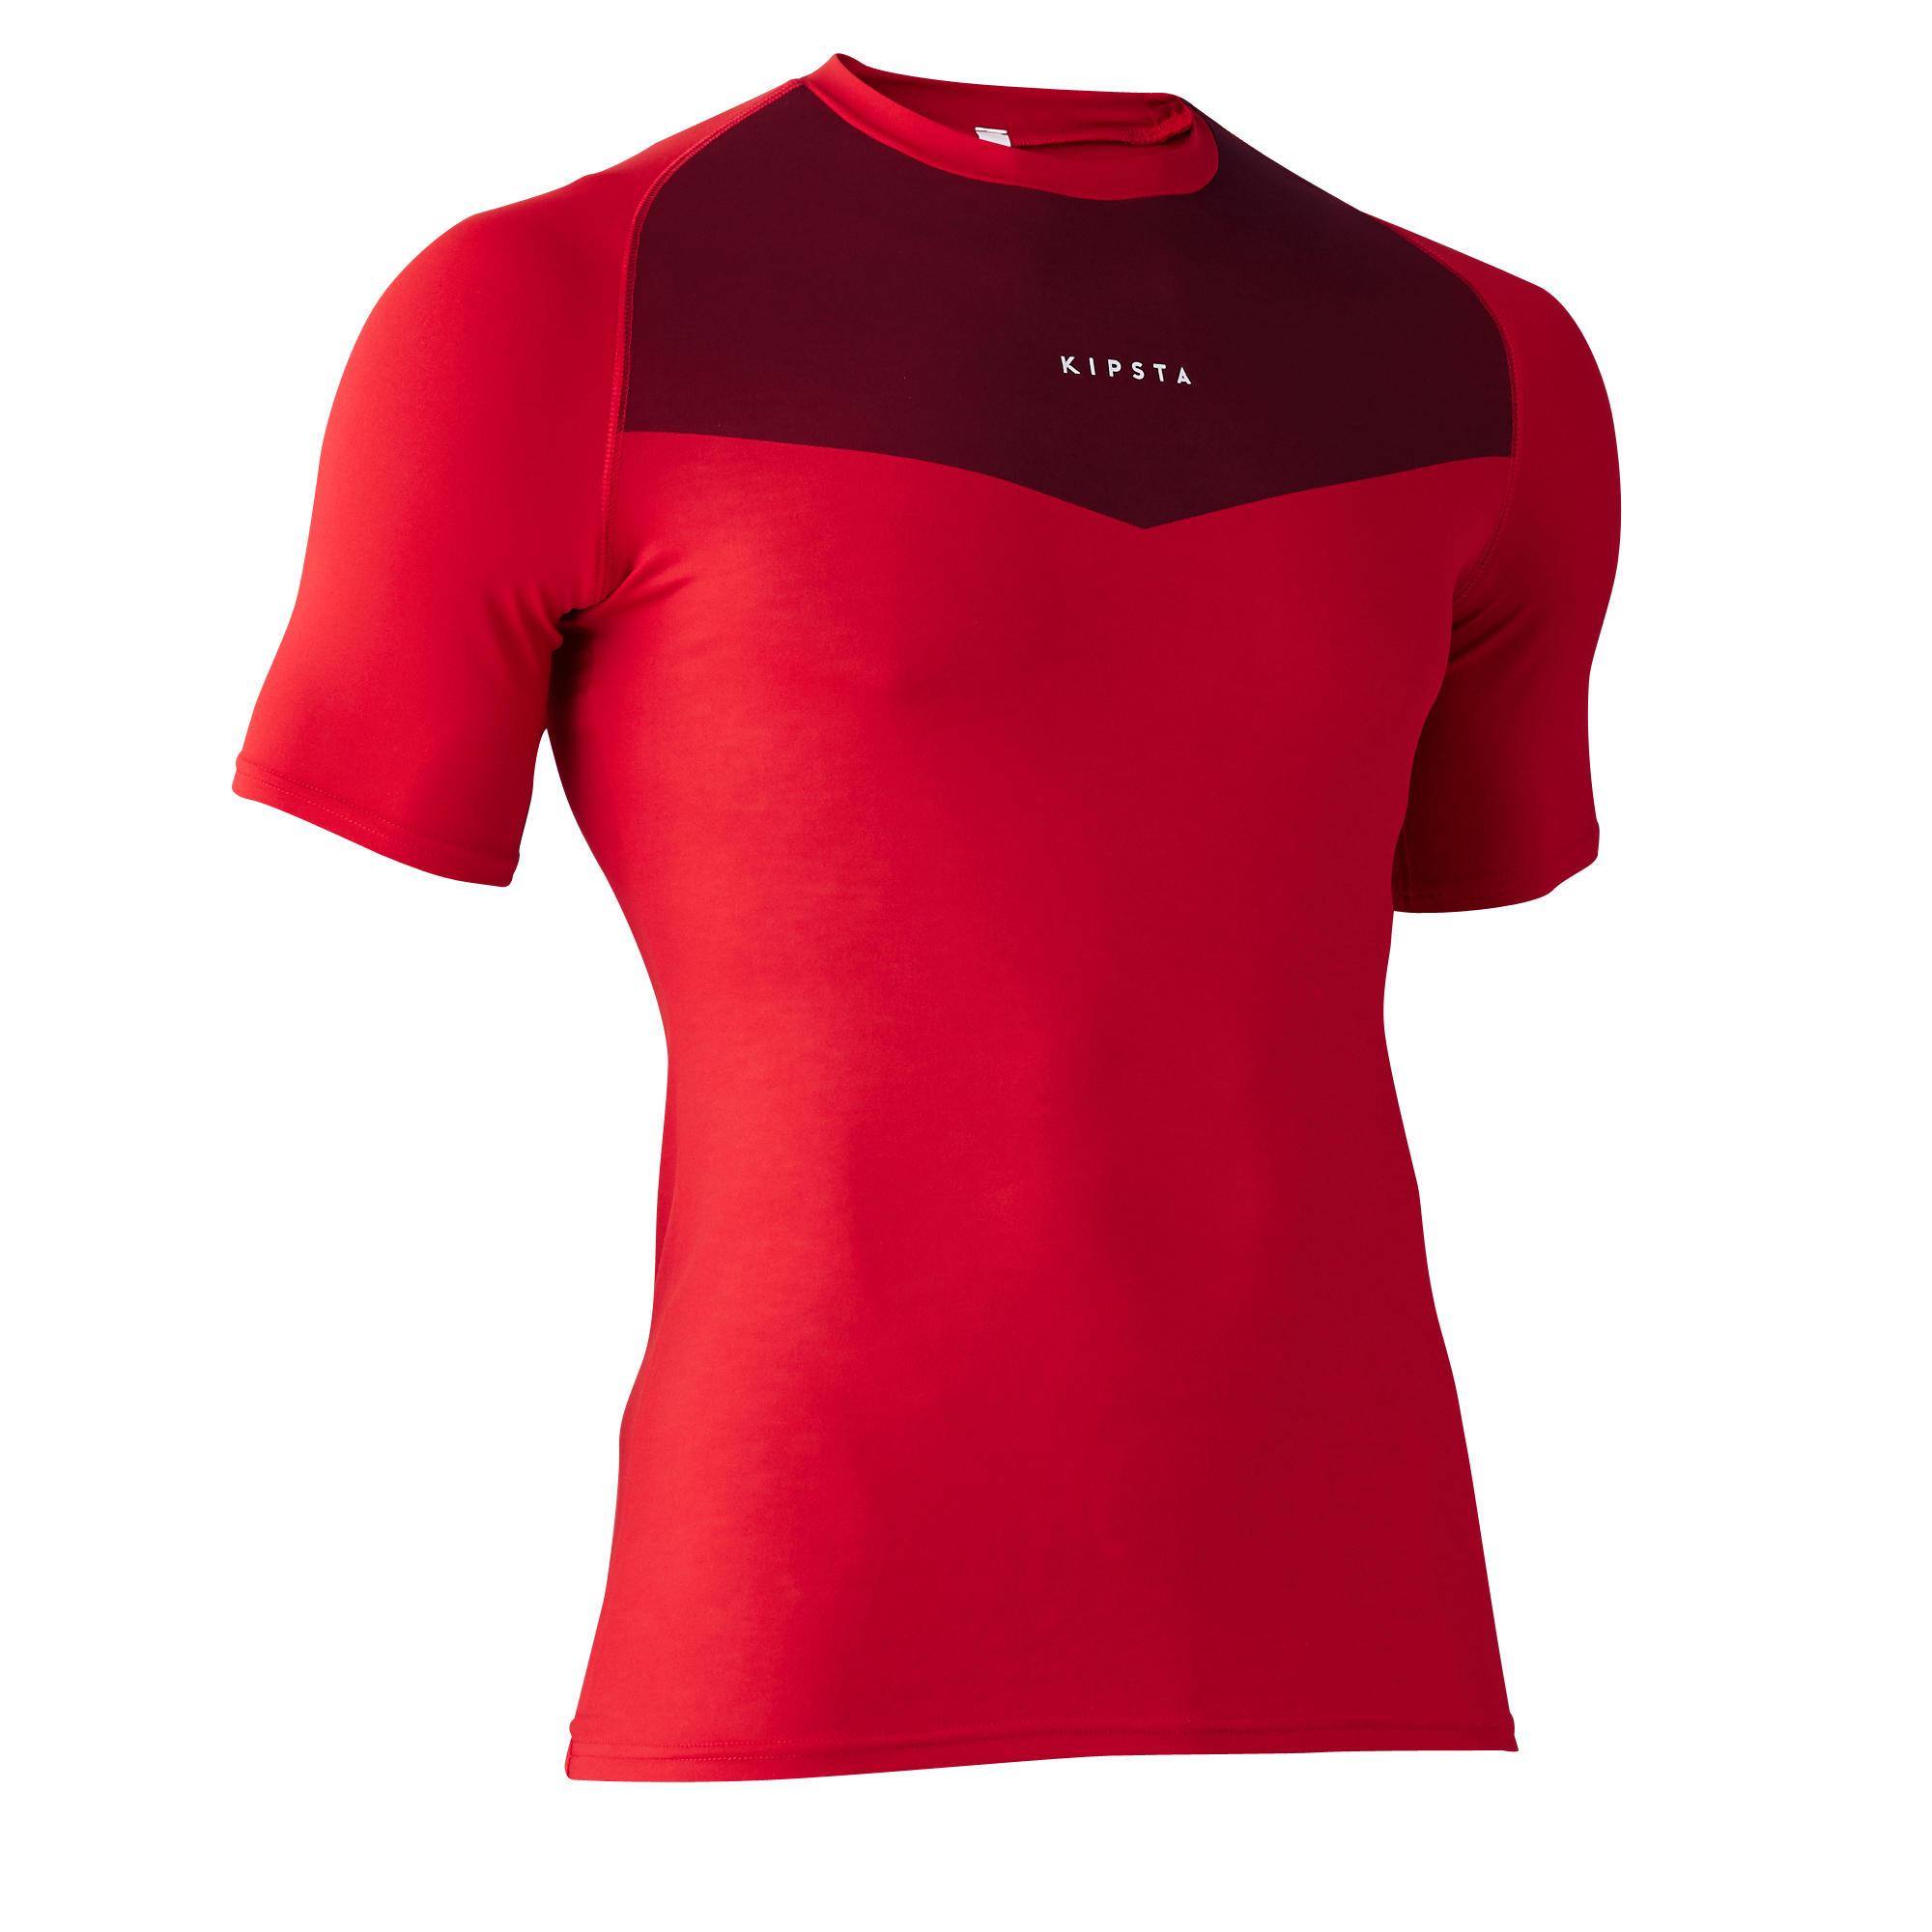 Kipsta Thermoshirt Keepdry 100 korte mouwen volwassenen rood